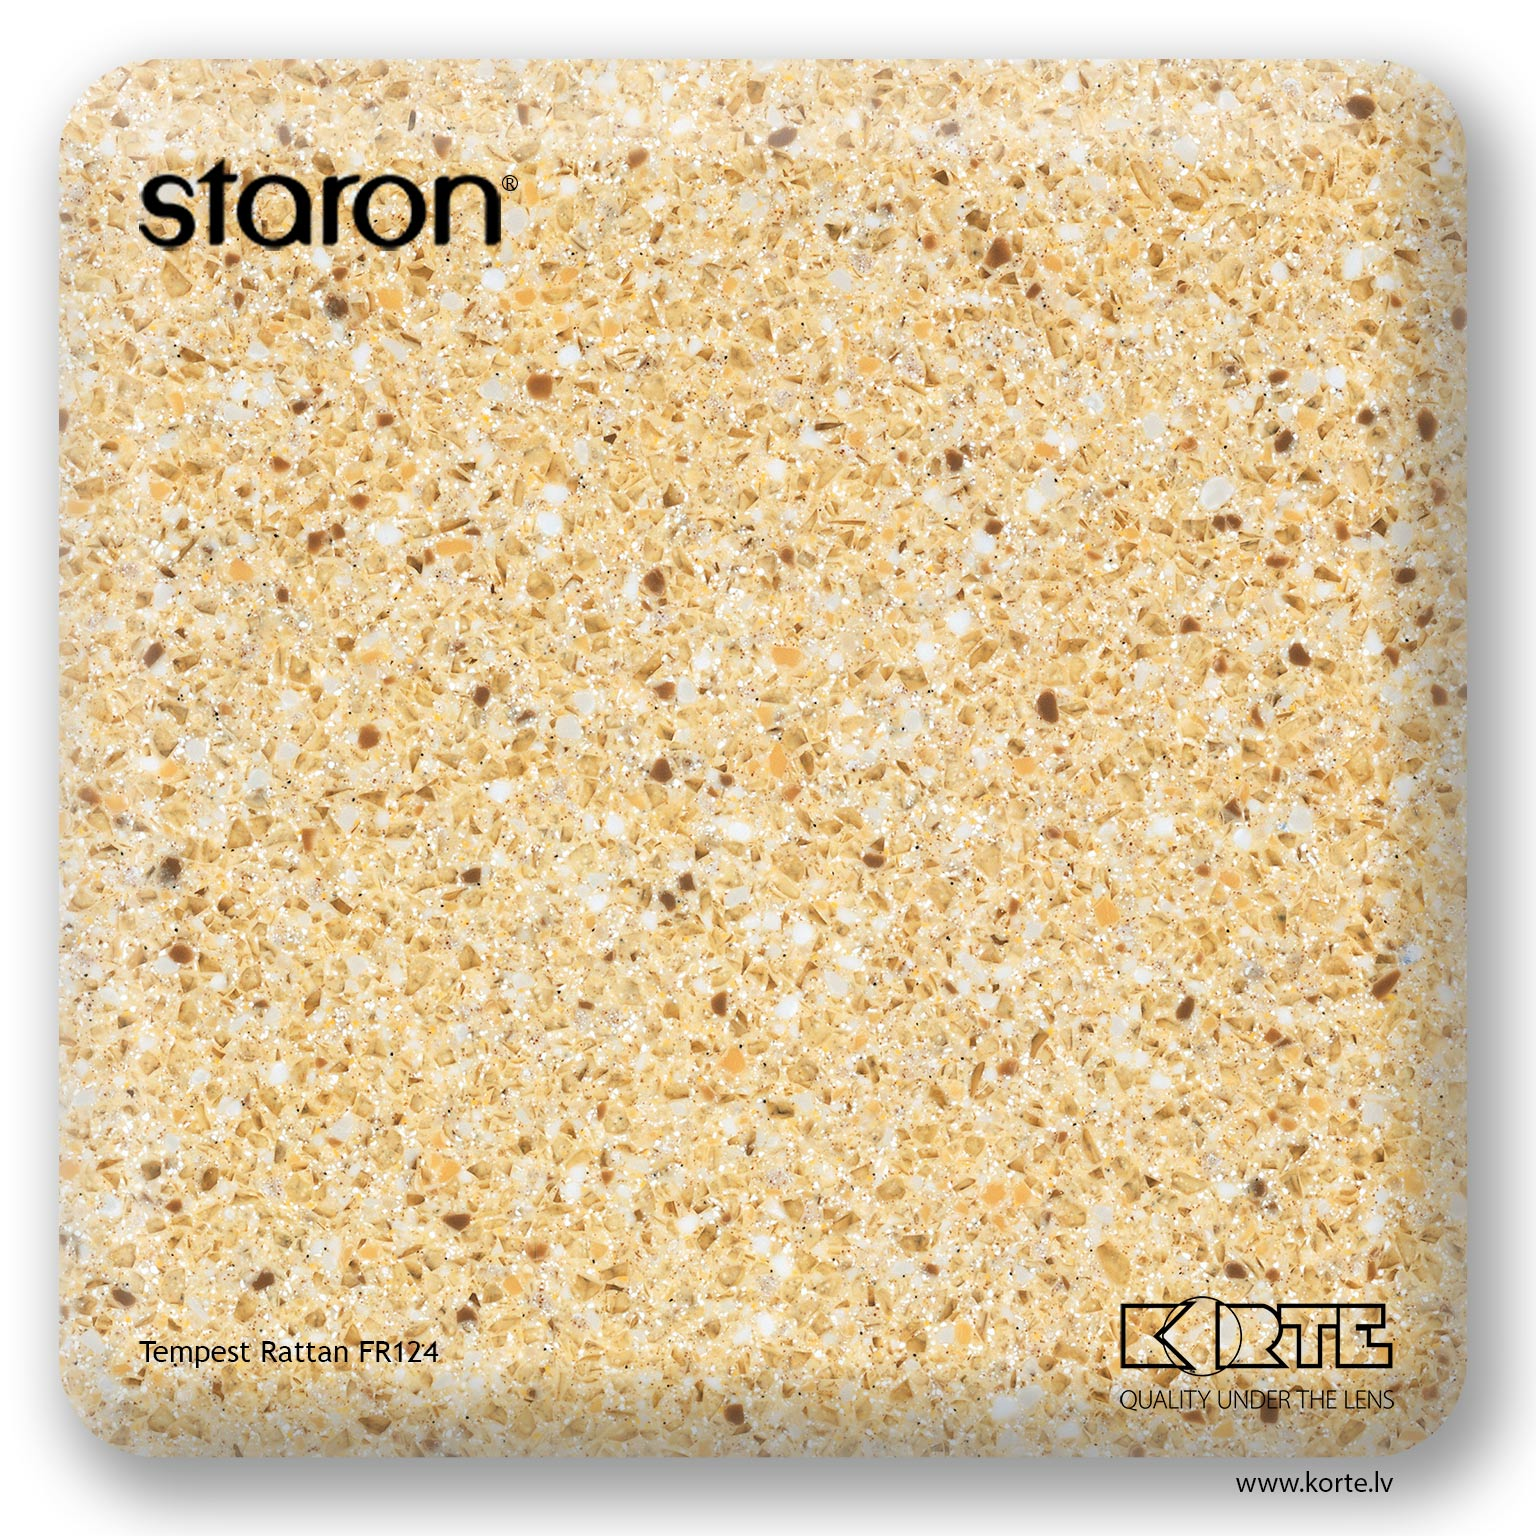 Staron Tempest Rattan FR124